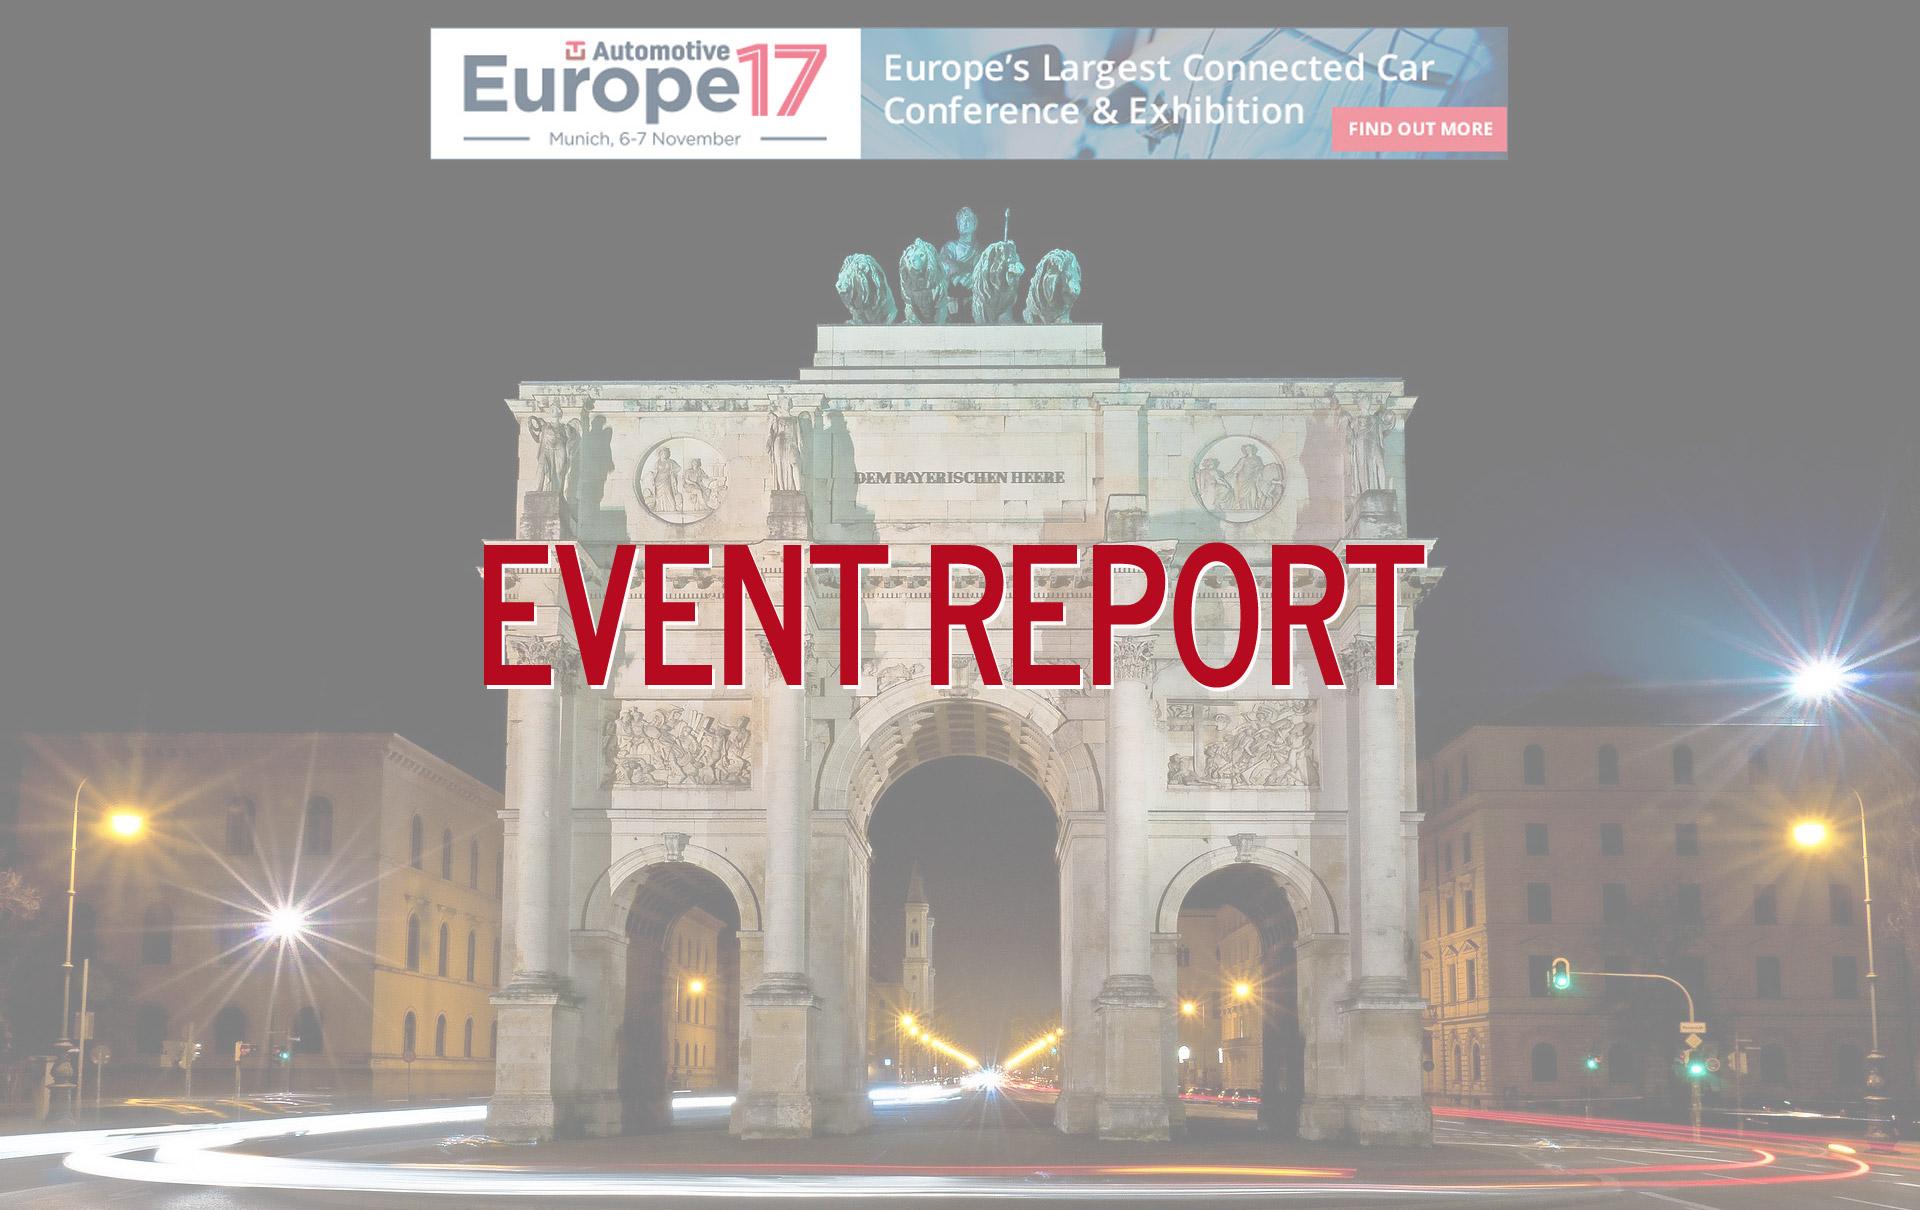 Event Report for TU Automotive Europe